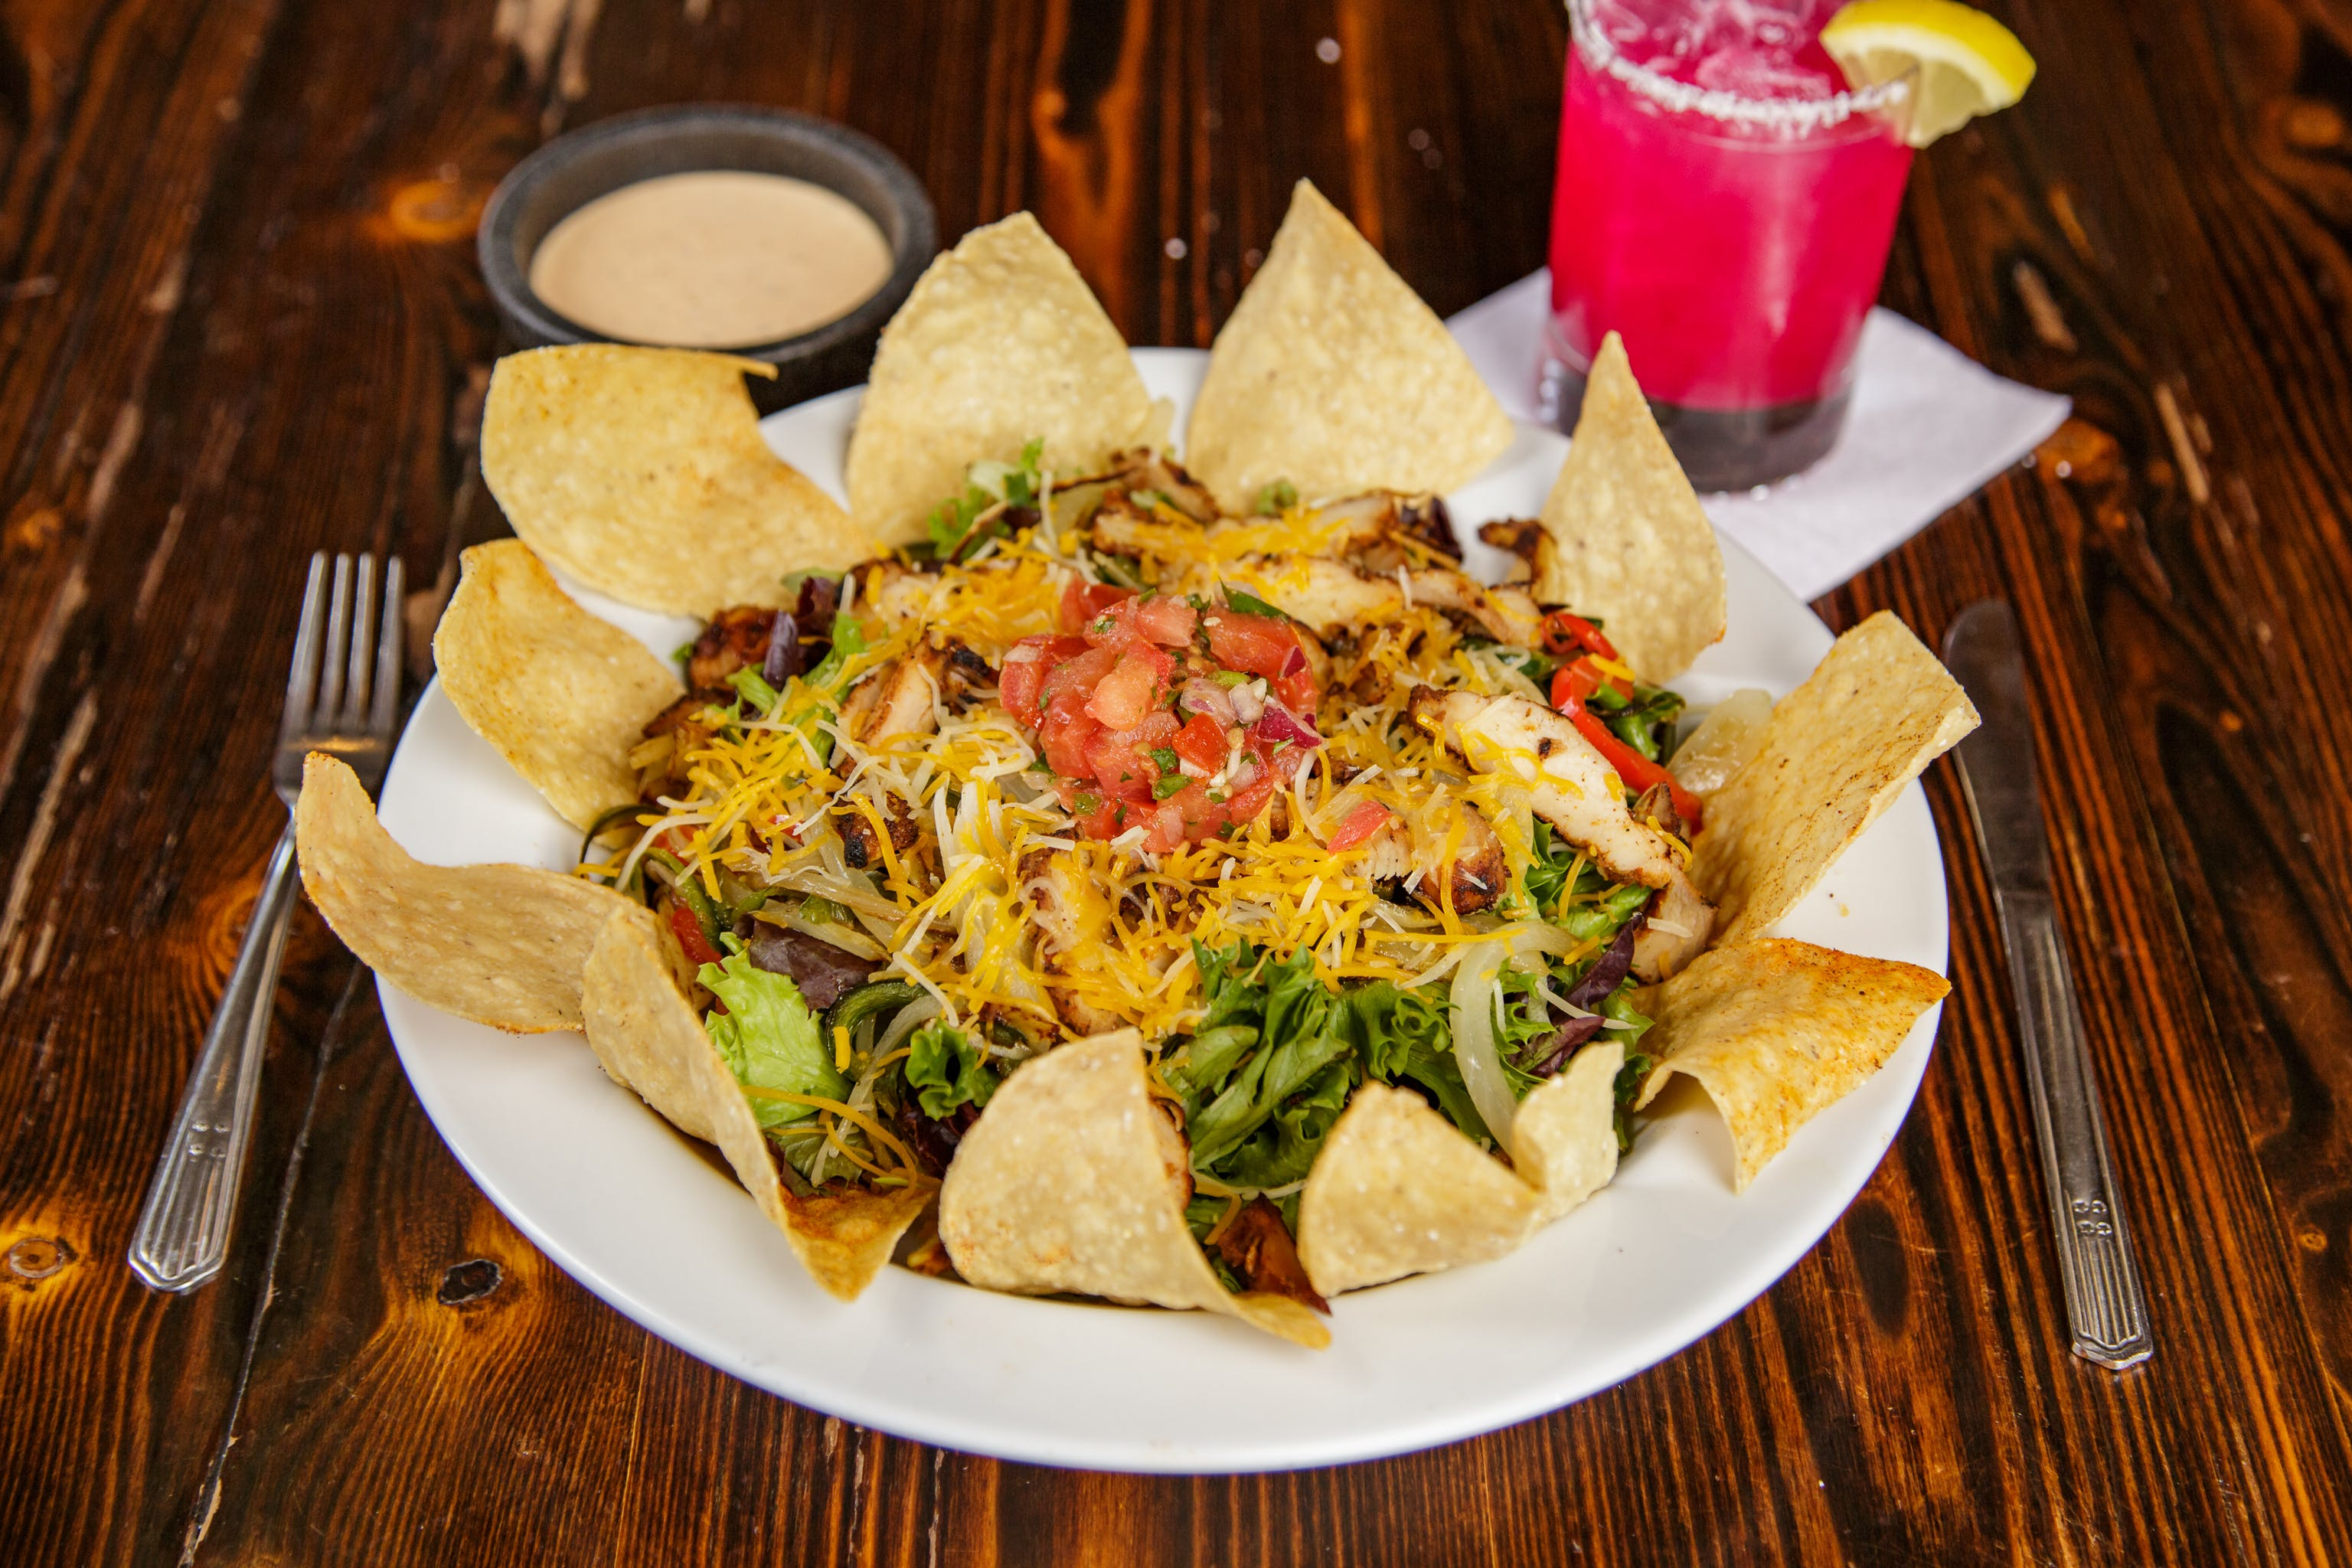 Fajita Taco Salad from Pasqual's Cantina - Hilldale in Madison, WI